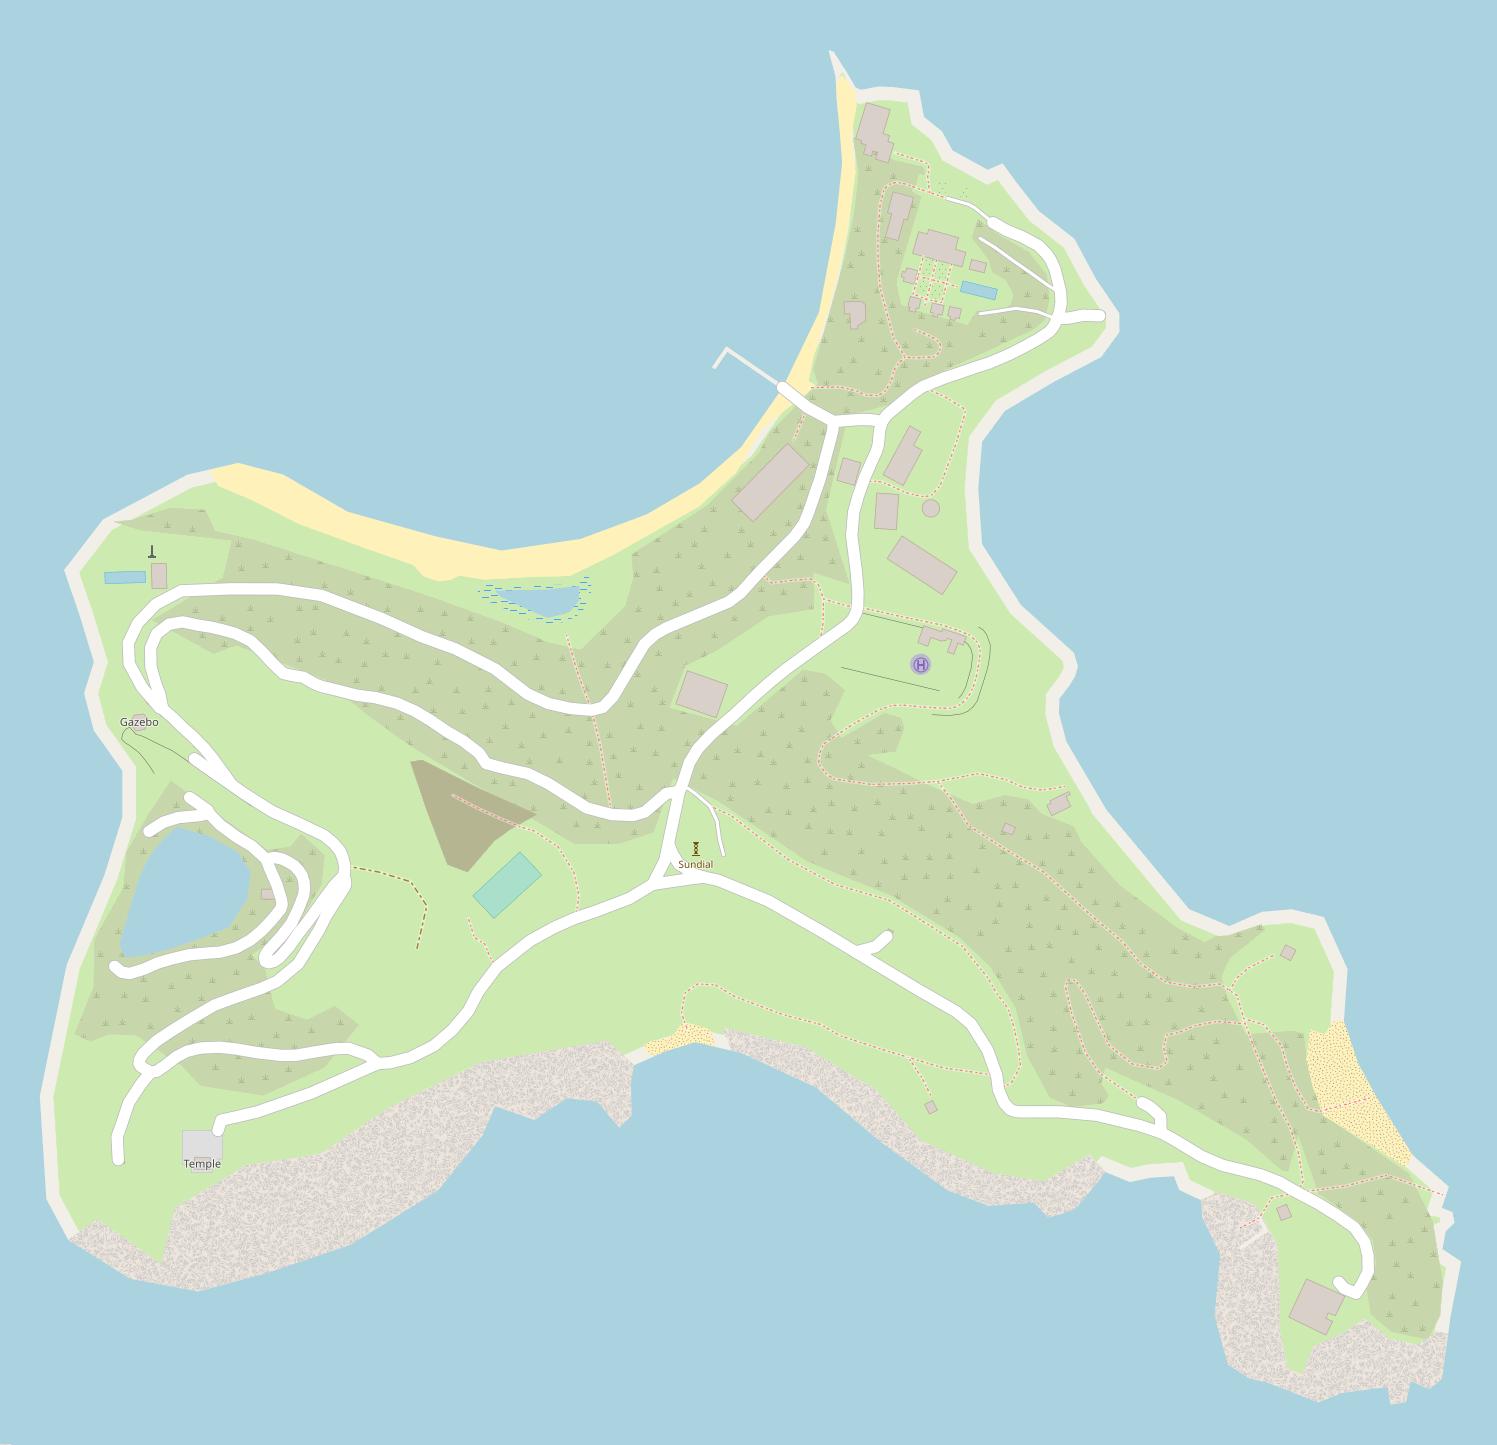 Little Saint James, U.S. Virgin Islands - Wikipedia